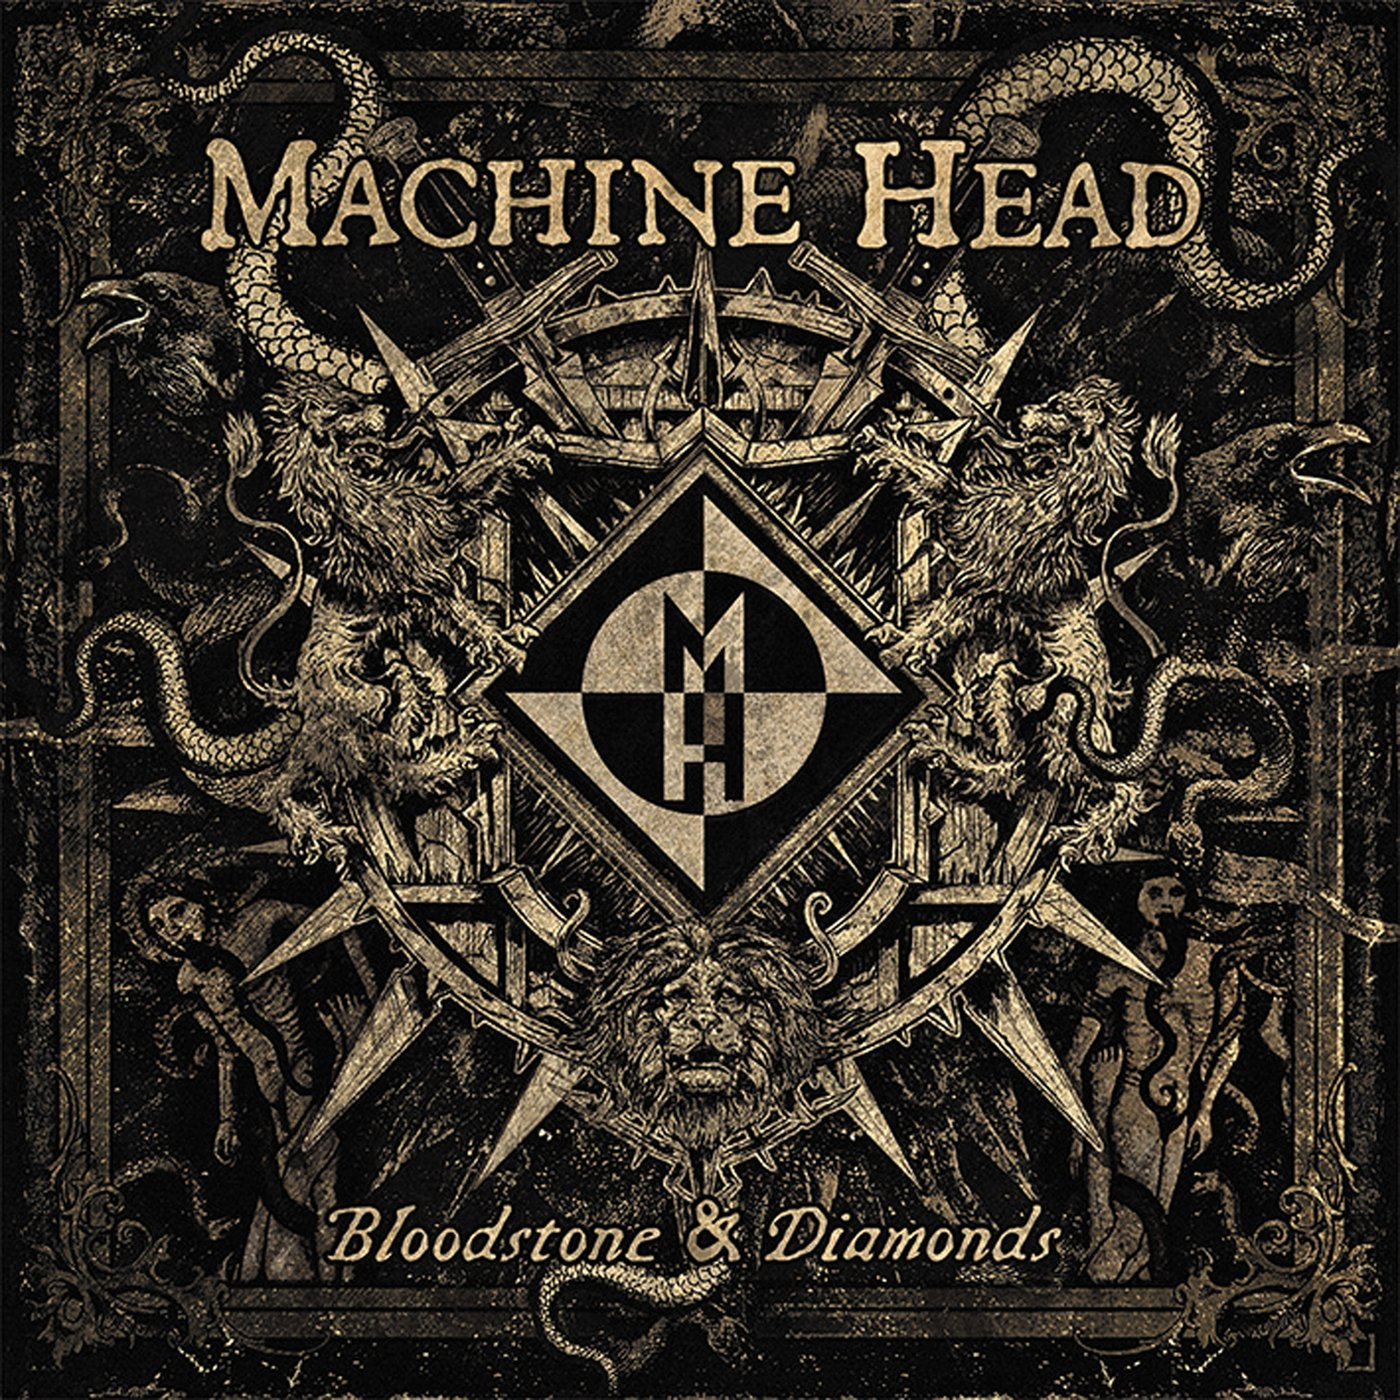 Machine Head Bloodstone & DIamonds 2014